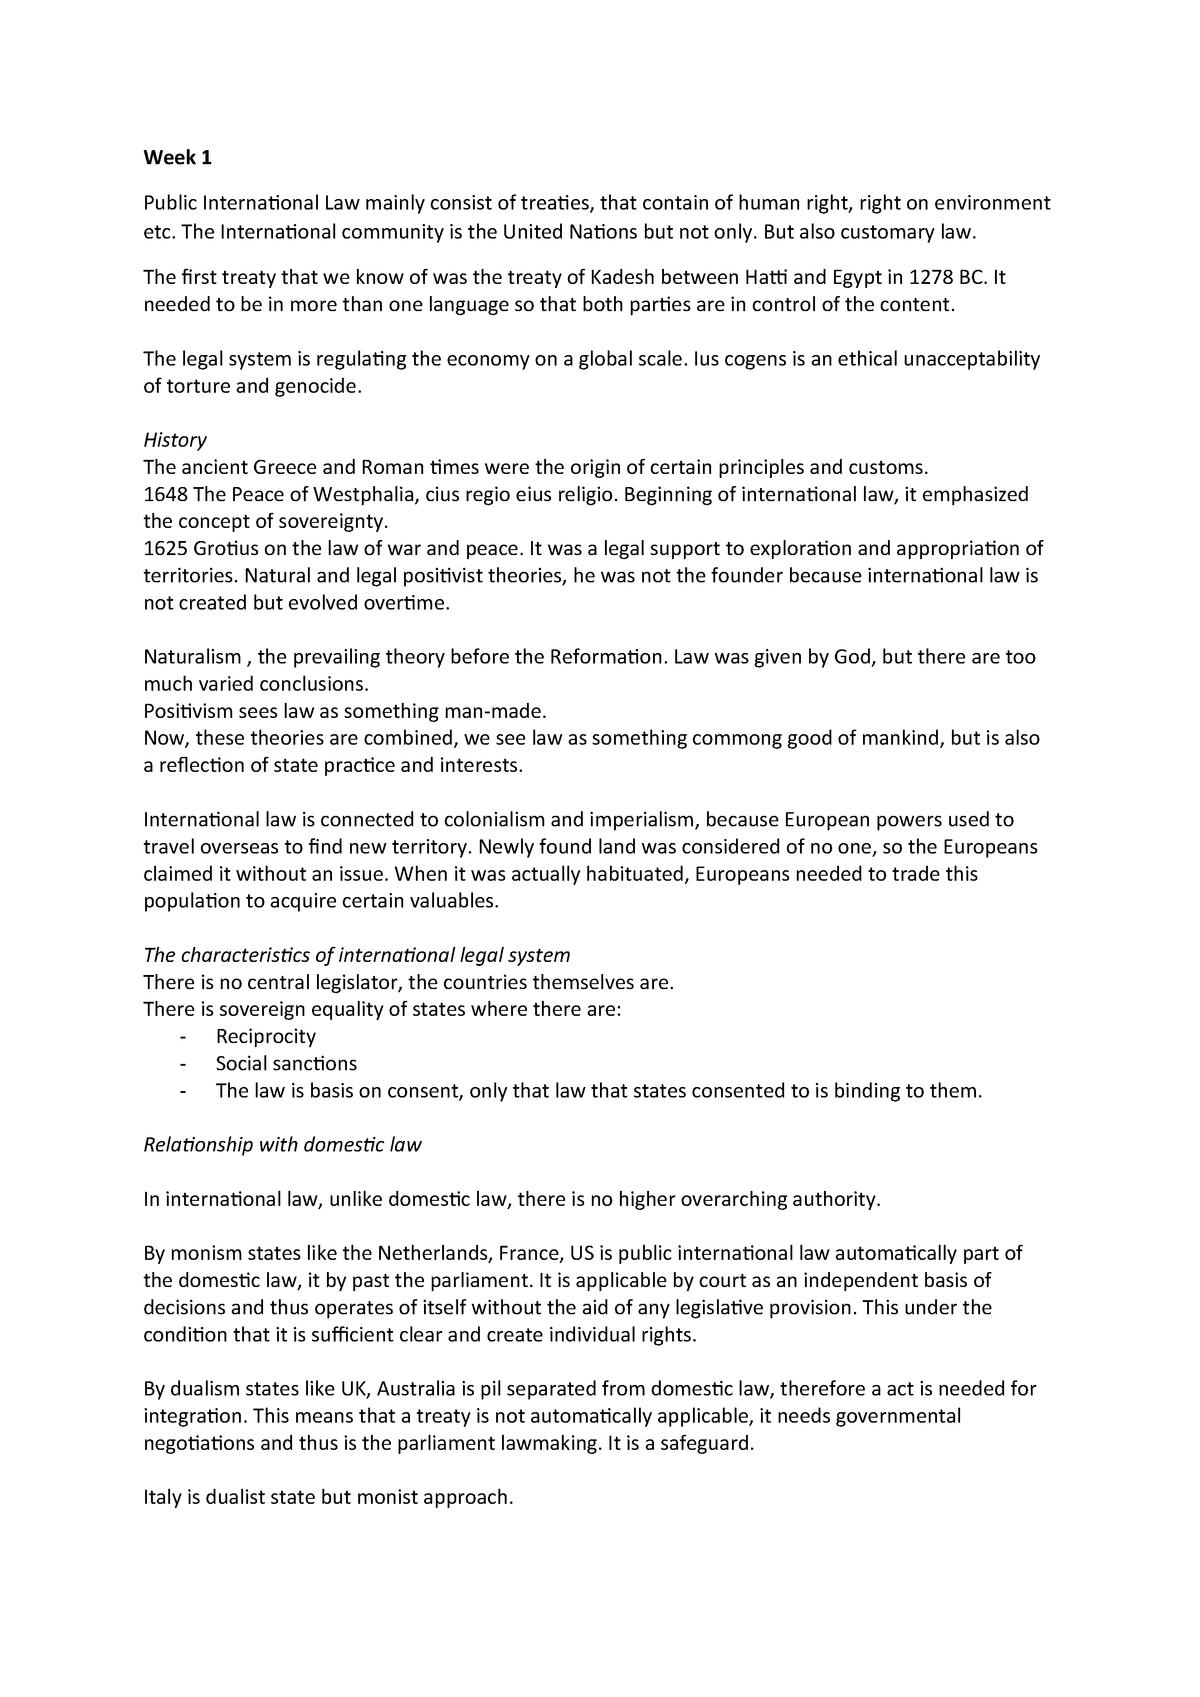 Sammanfattning RGBUIER002 RGBUIER002 06 Apr 2018 - StuDocu